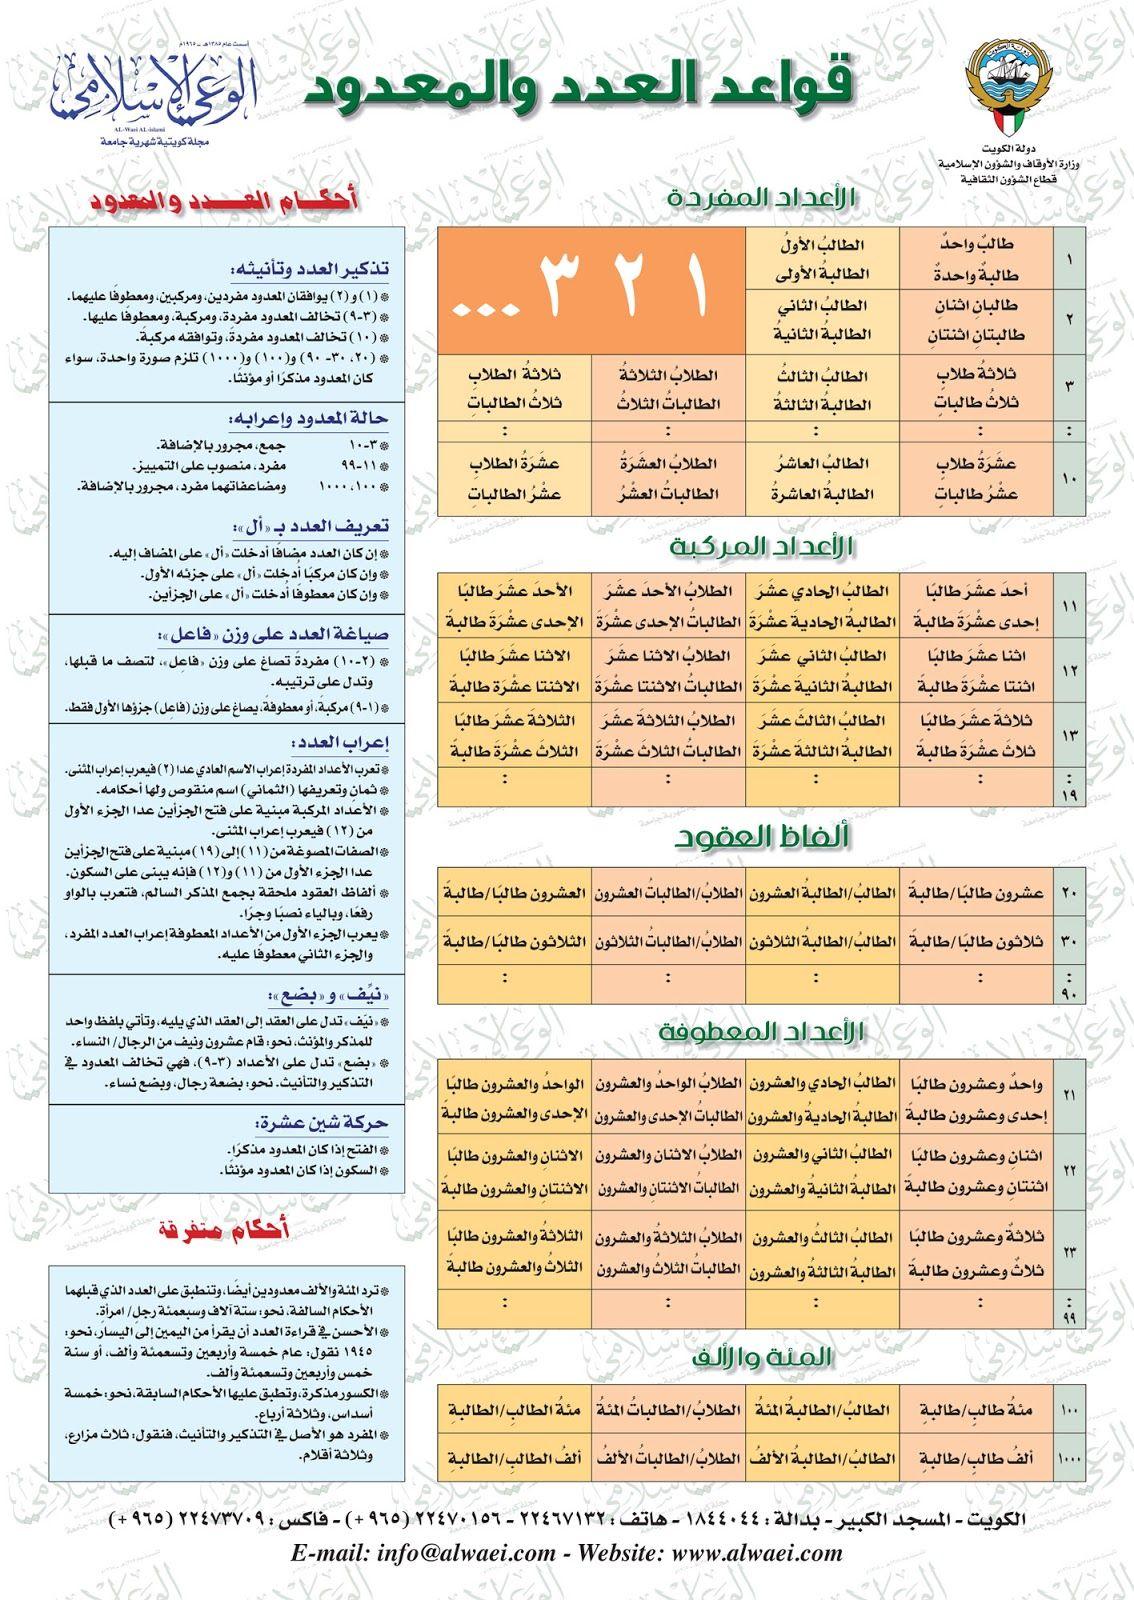 4 Bp Blogspot Com P7a7rcp4rpu Vxqmcsn Yvi Aaaaaaaabx0 8 6nzfvo Qu6mxatomqzd7zogite7fzhgclcb S1600 Al Learn Arabic Language Learn Arabic Online Arabic Language